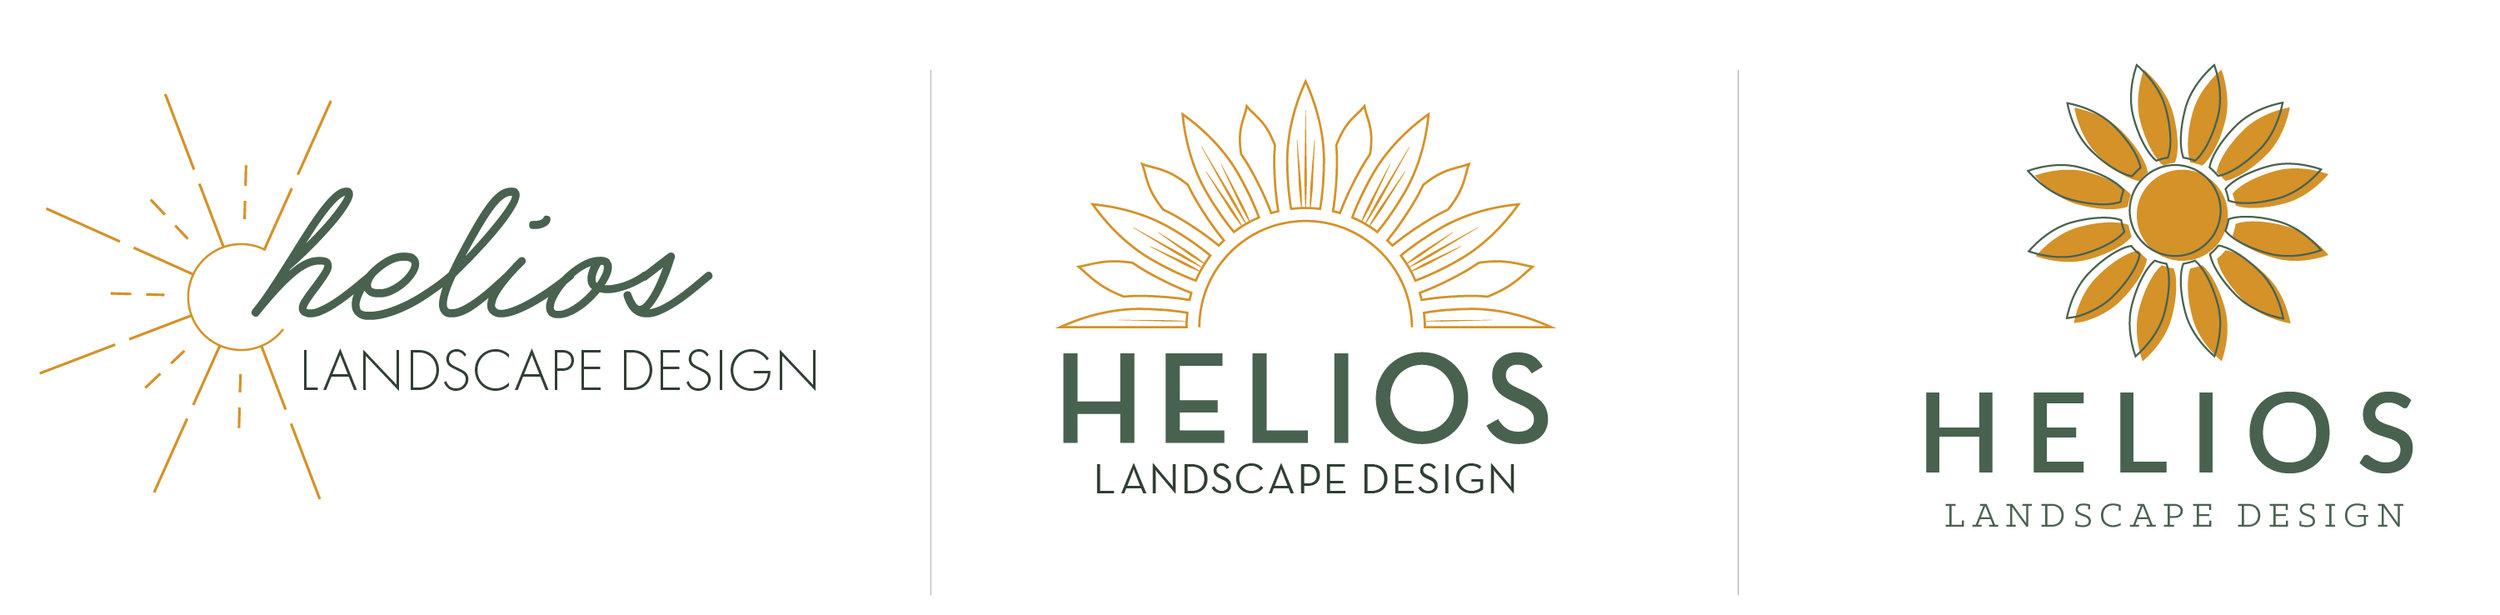 HeliosLandscapeDesign_LogoTrials-05.jpg